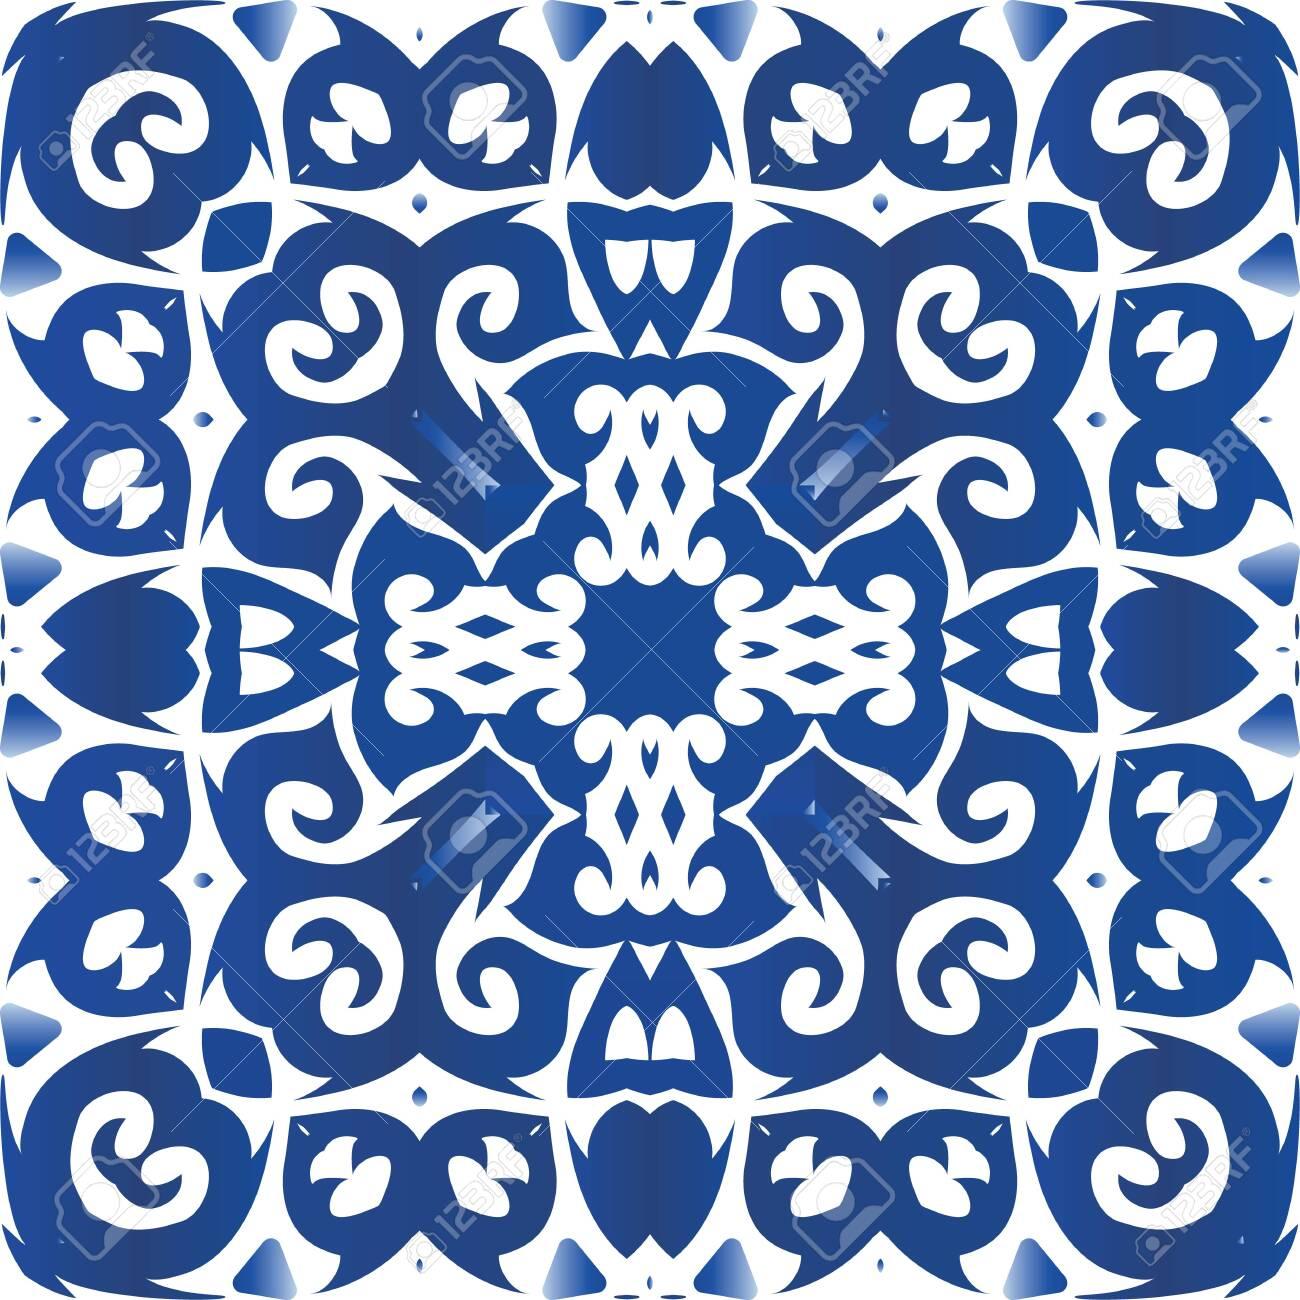 Portuguese vintage azulejo tiles. Vector seamless pattern theme. Stylish design. Blue antique background for pillows, print, wallpaper, web backdrop, towels, surface texture. - 145816983